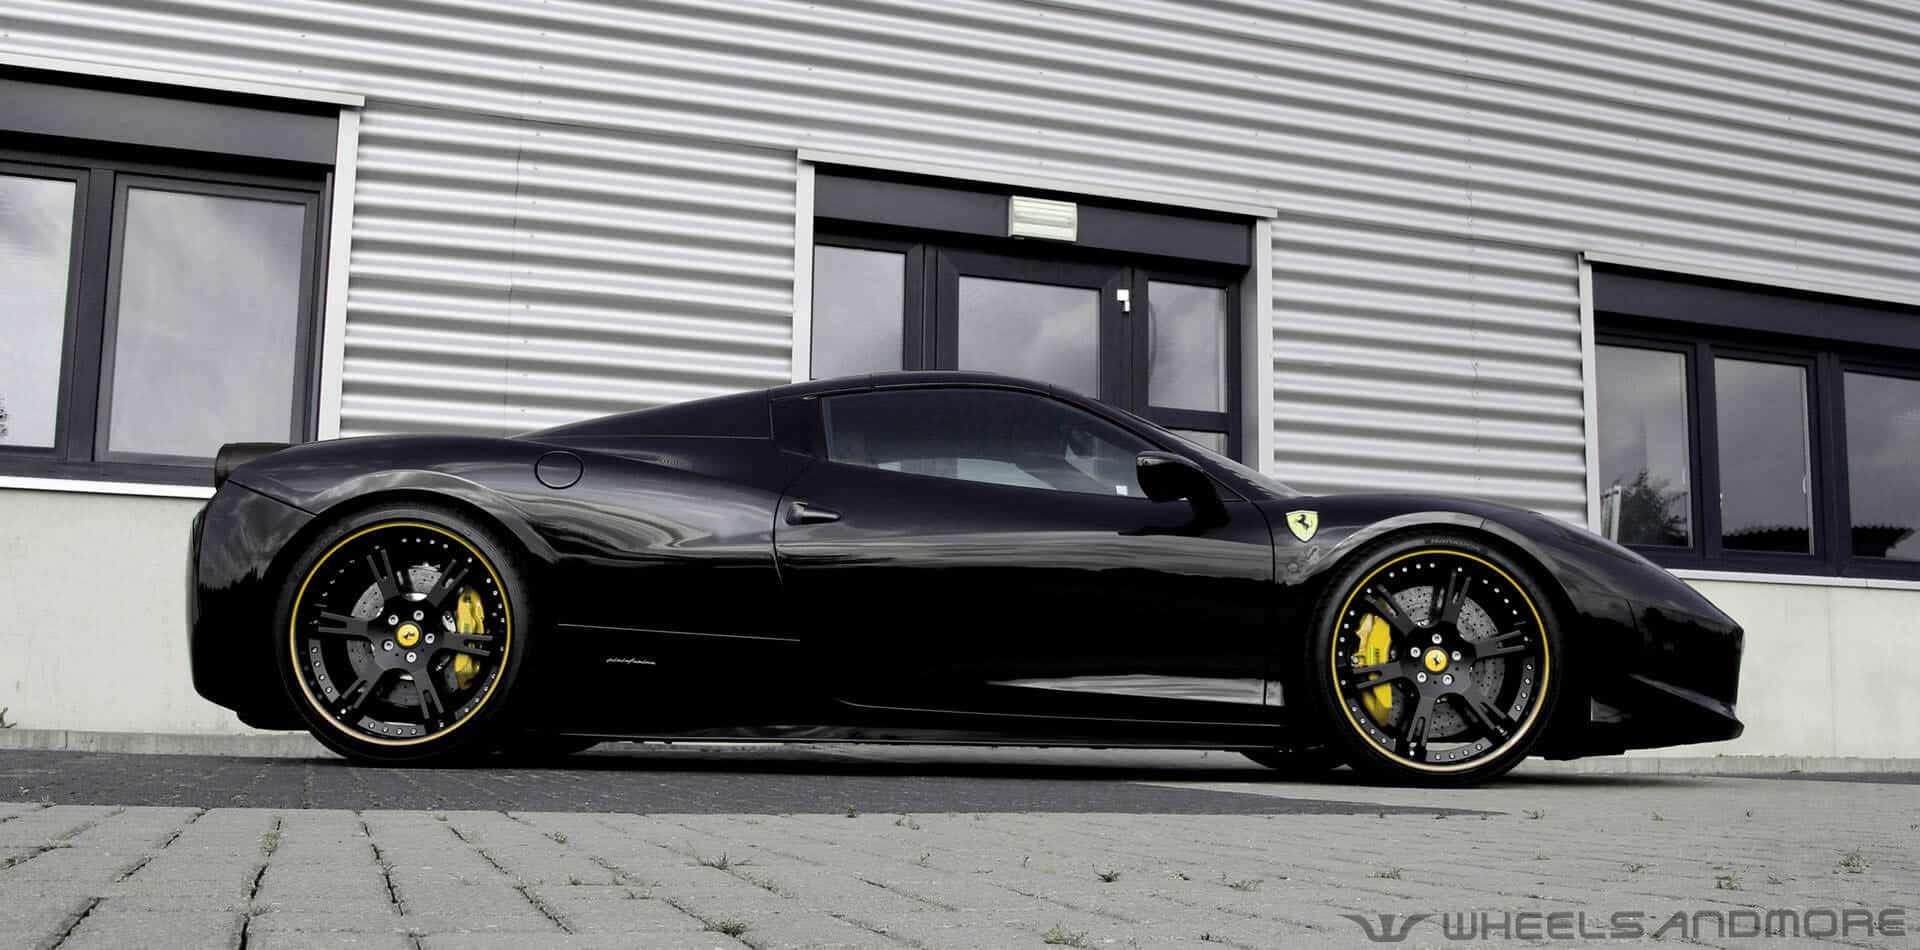 Ferrari 458 Italia Tuning Wheels And Exhaust Wheelsandmore